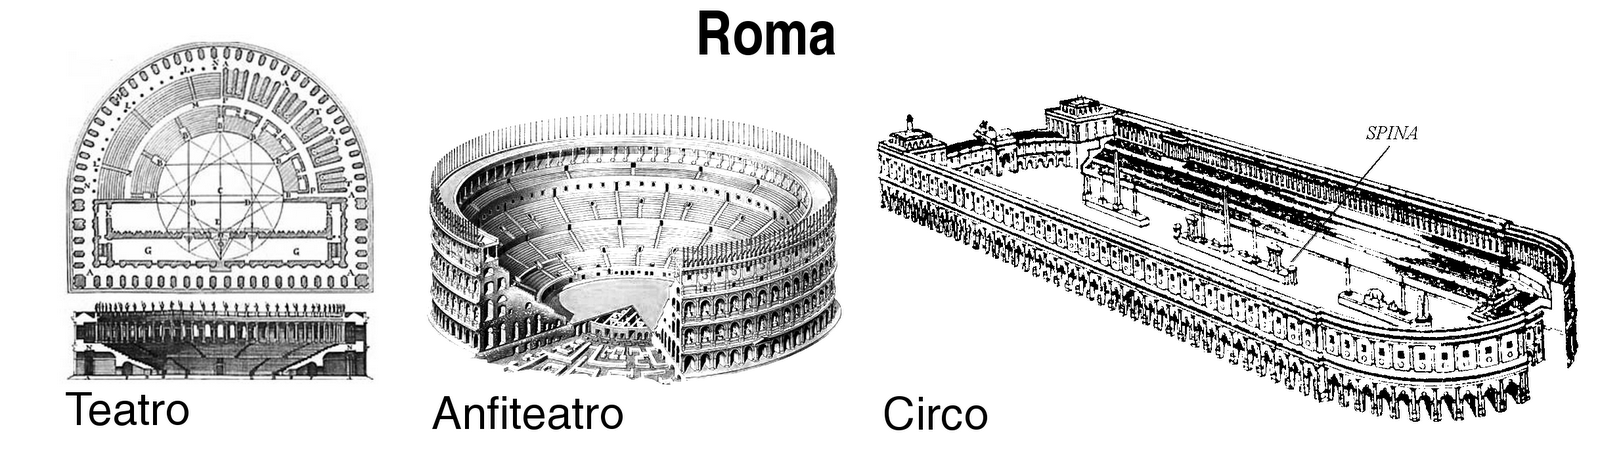 diferencia entre griego romano: